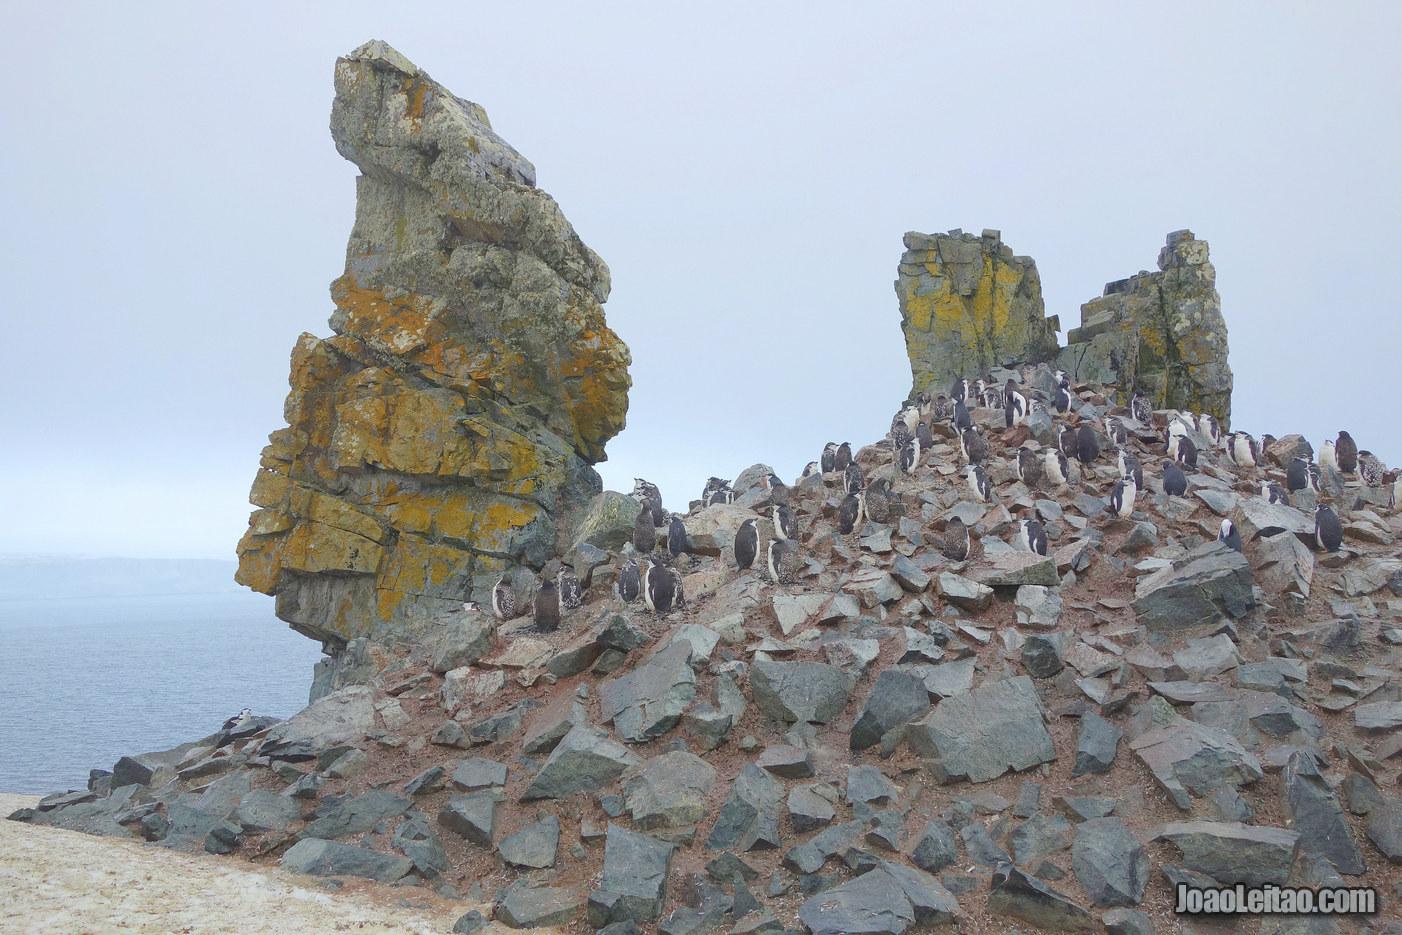 Visit Half Moon Island in Antarctica